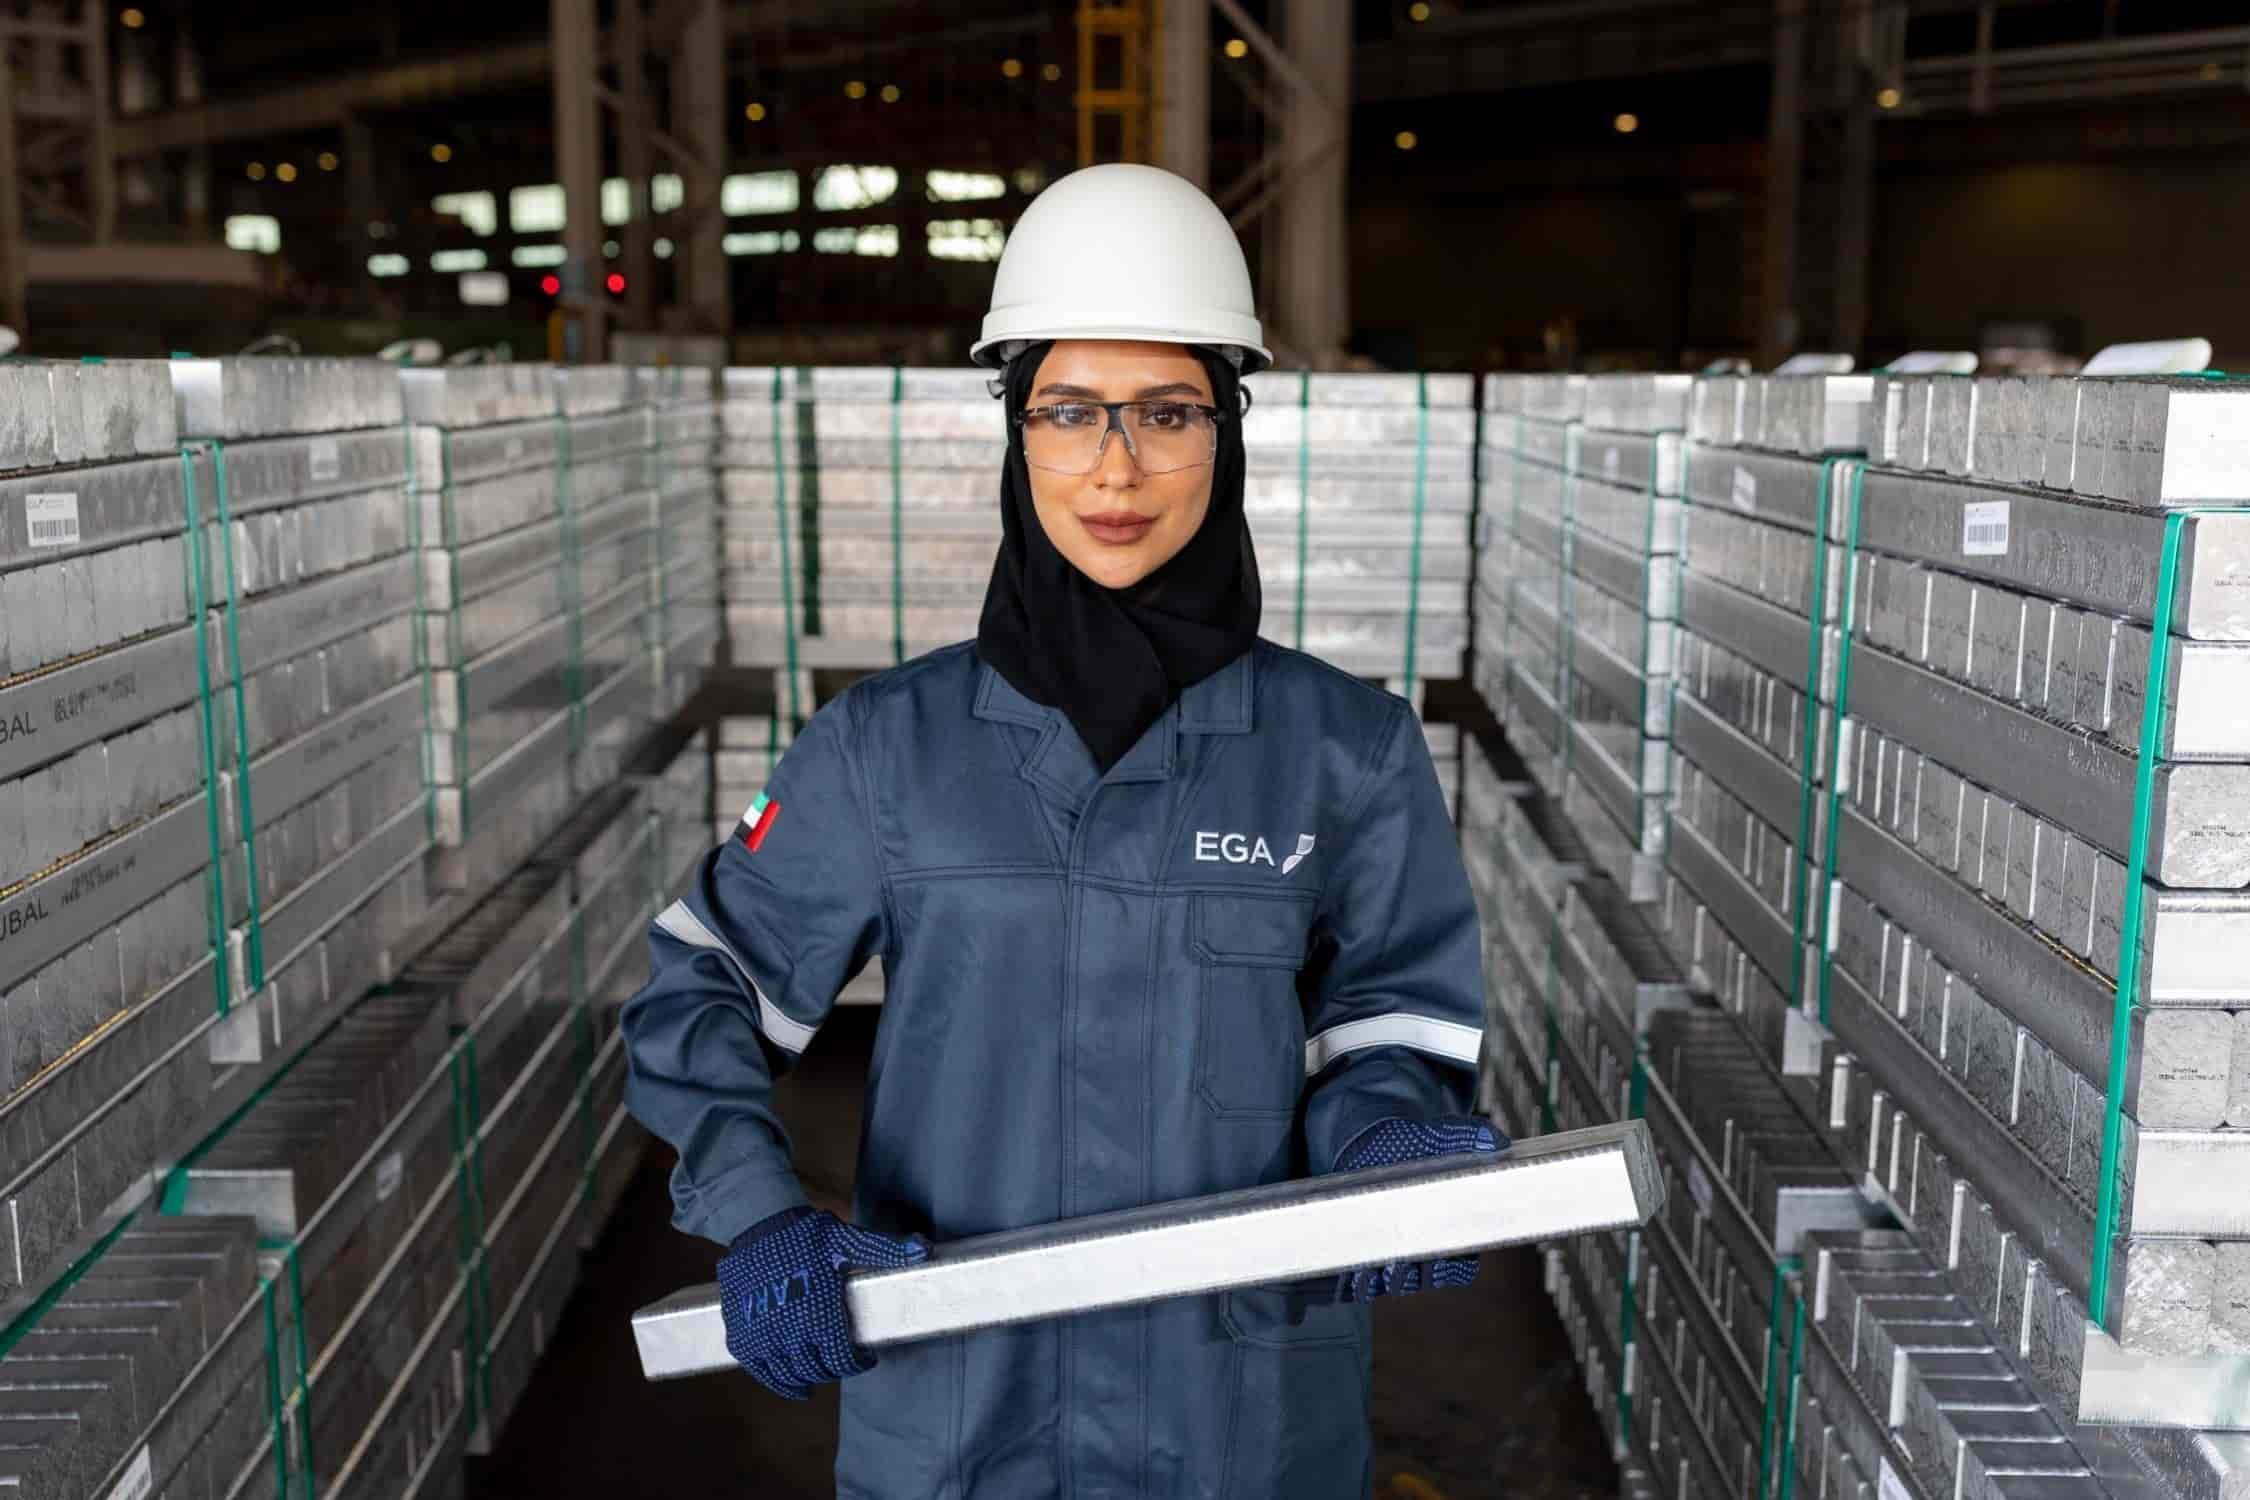 Khuloud Suhool, la superintendente general Prozesskontrolle, Emirates Global Aluminium. Foto: EGA (01/2021)